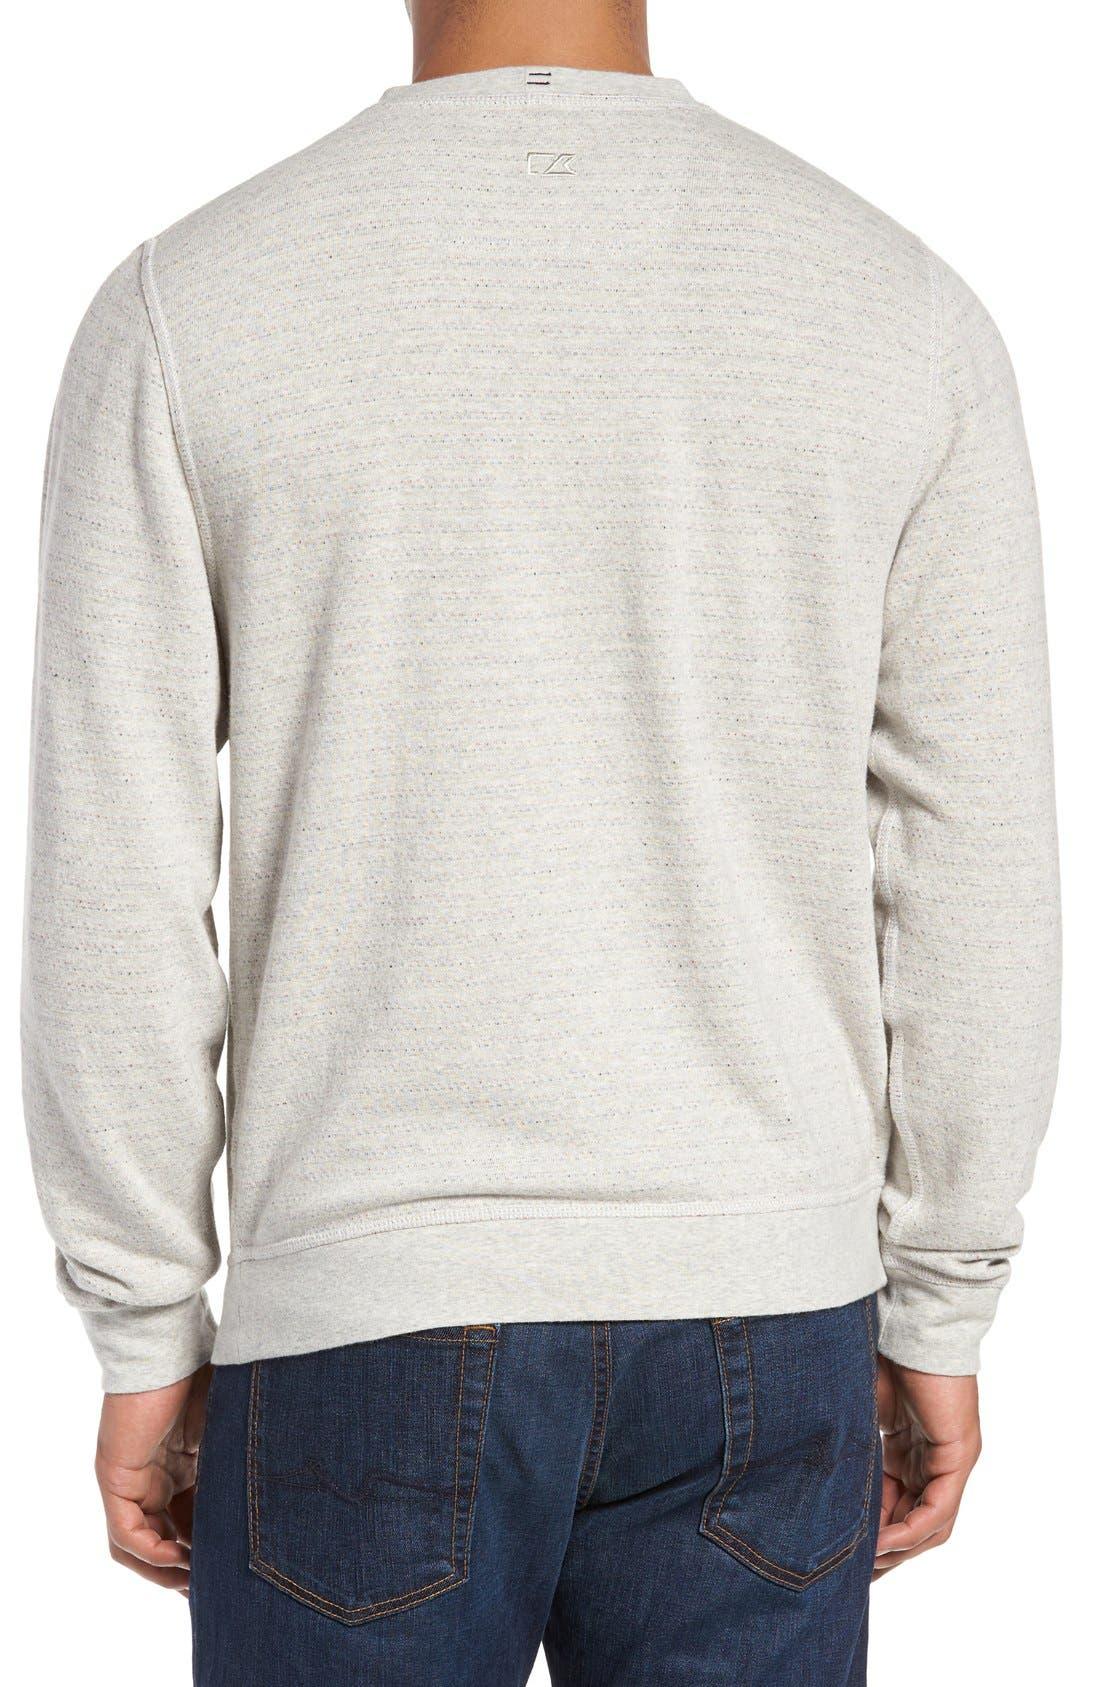 'Gleann' French Terry Crewneck Sweatshirt,                             Alternate thumbnail 4, color,                             250